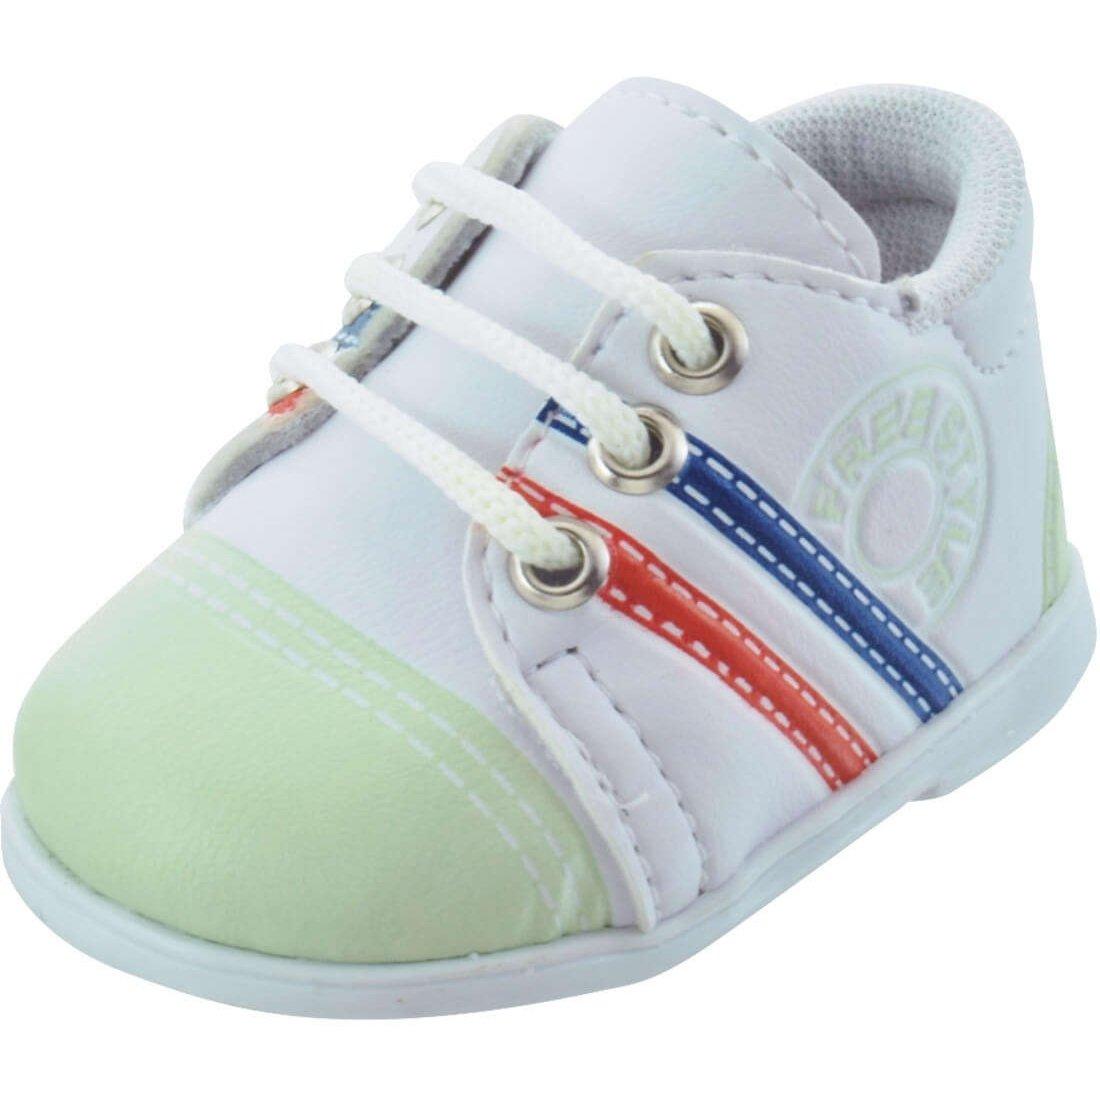 Infantil 107 Sapatênis Infantil 107 Branco Sapatênis Infantil Pekenos Branco Mimos Mimos Pekenos Mimos Pekenos Sapatênis YfgwrqY